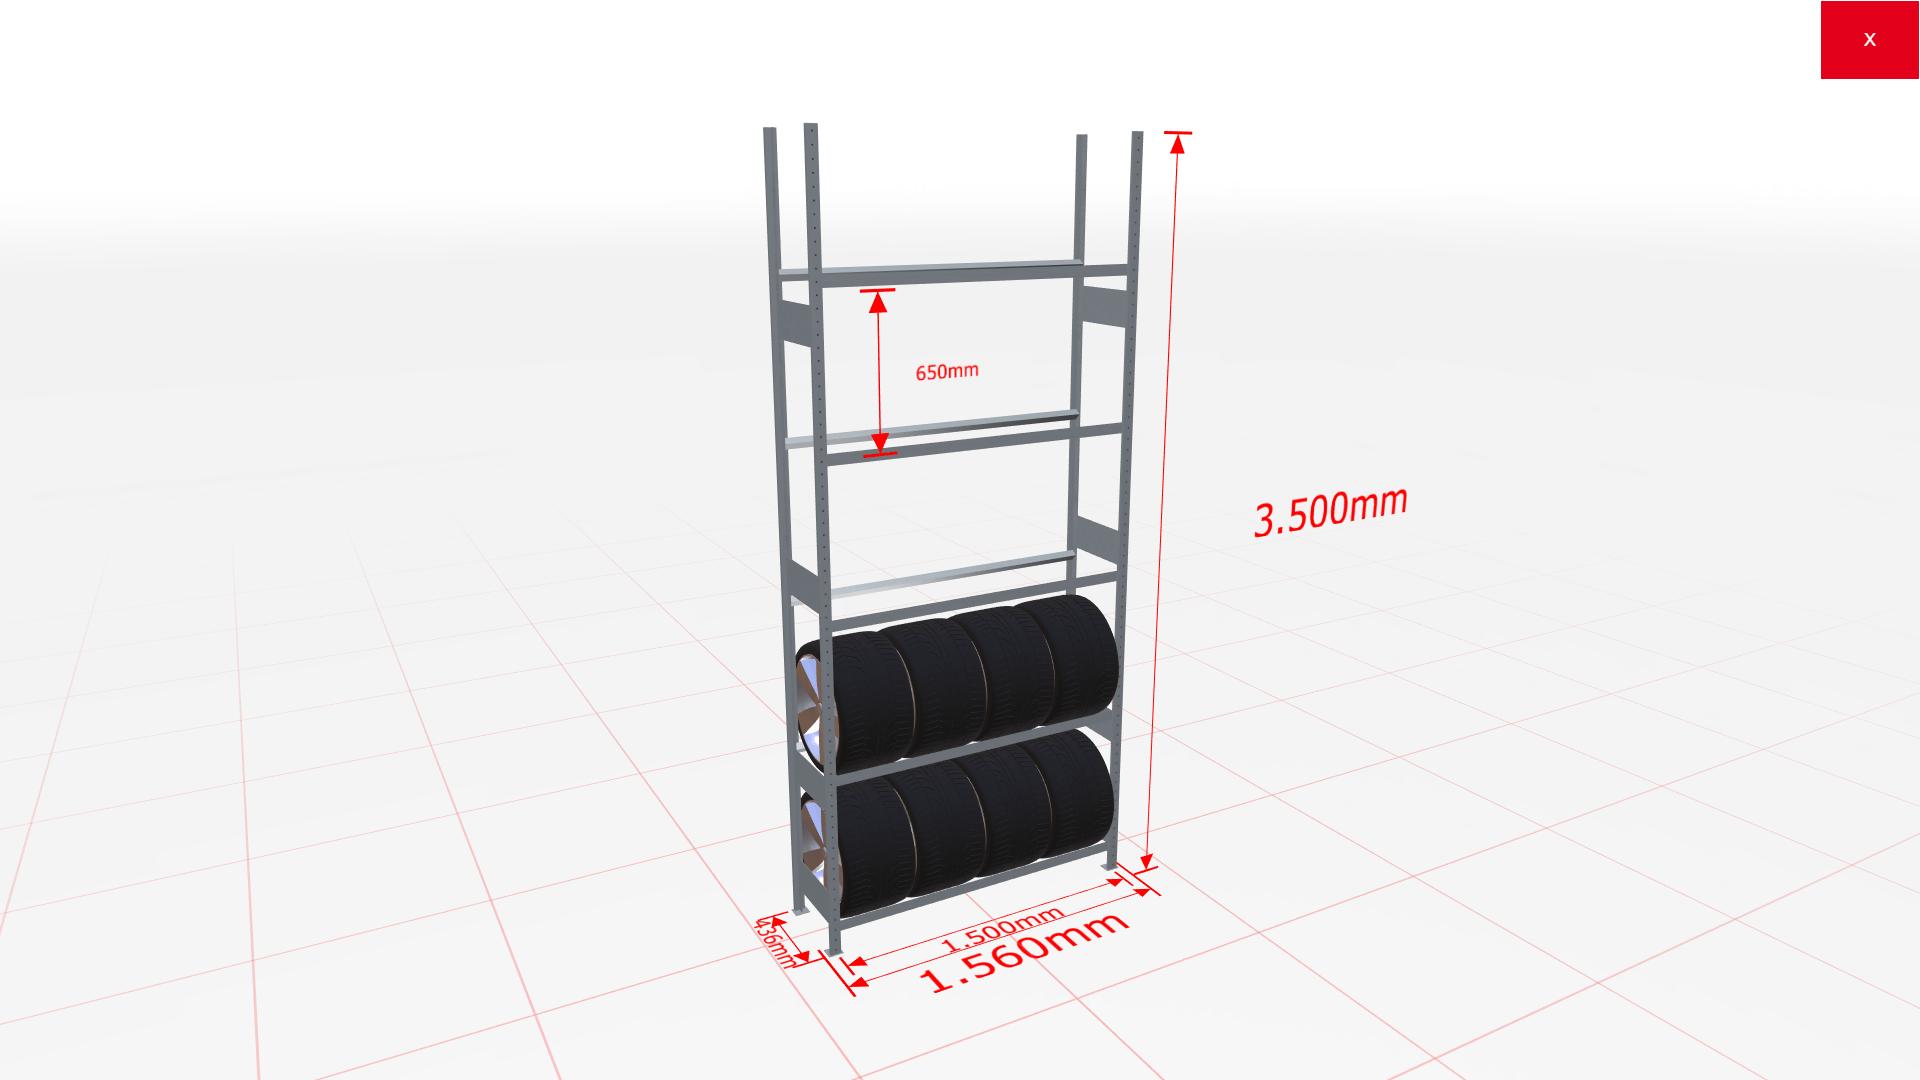 Reifenregal Grundregal SCHULTE Lagertechnik 3500x1500x400 mm – 5 Ebenen à 1500 mm, verzinkt